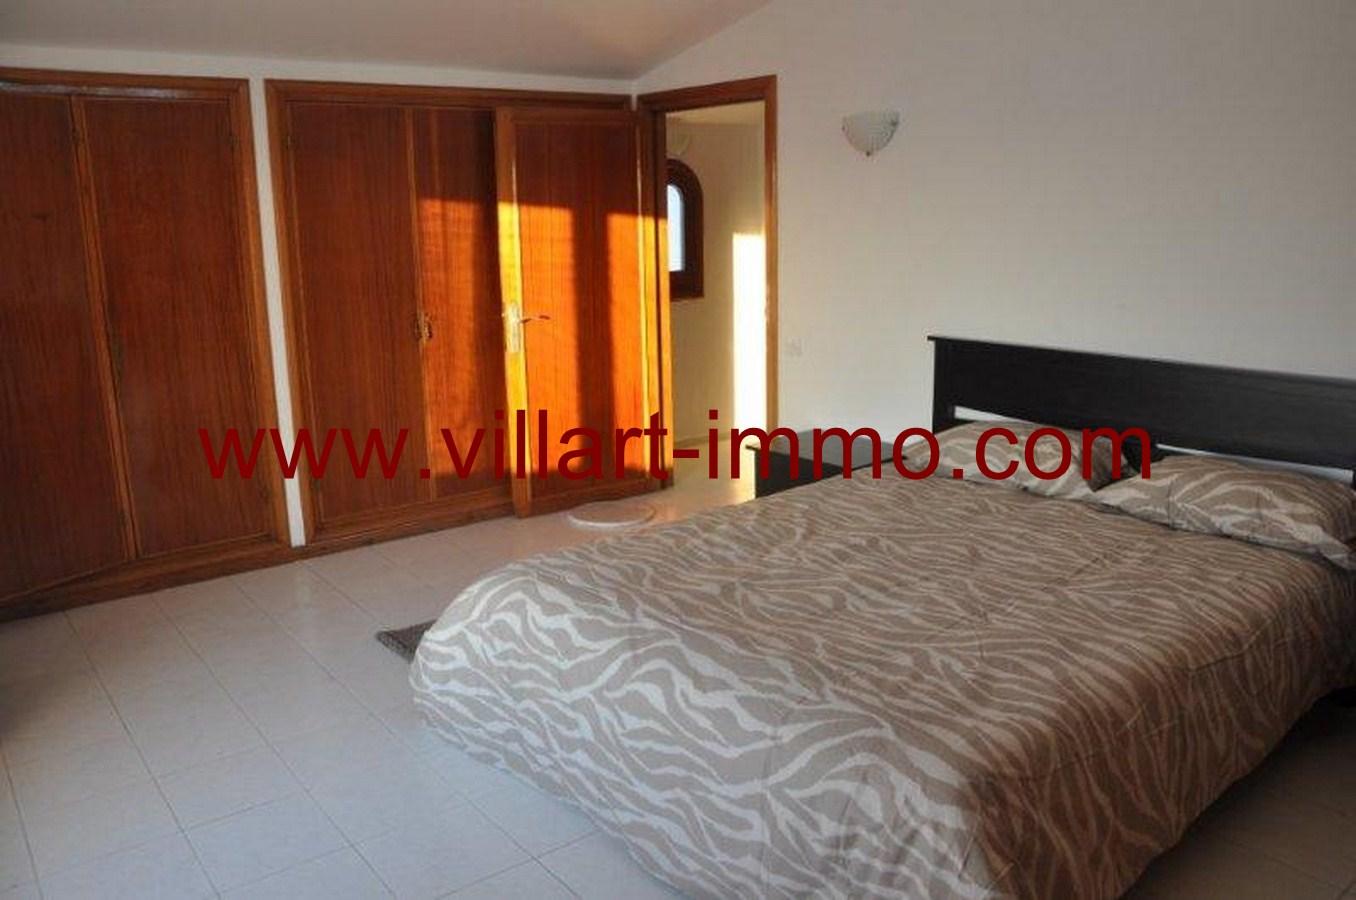 9-Location-Villa-Meublé-Malabata-Chambre 1-Villart immo-Tanger-LV126